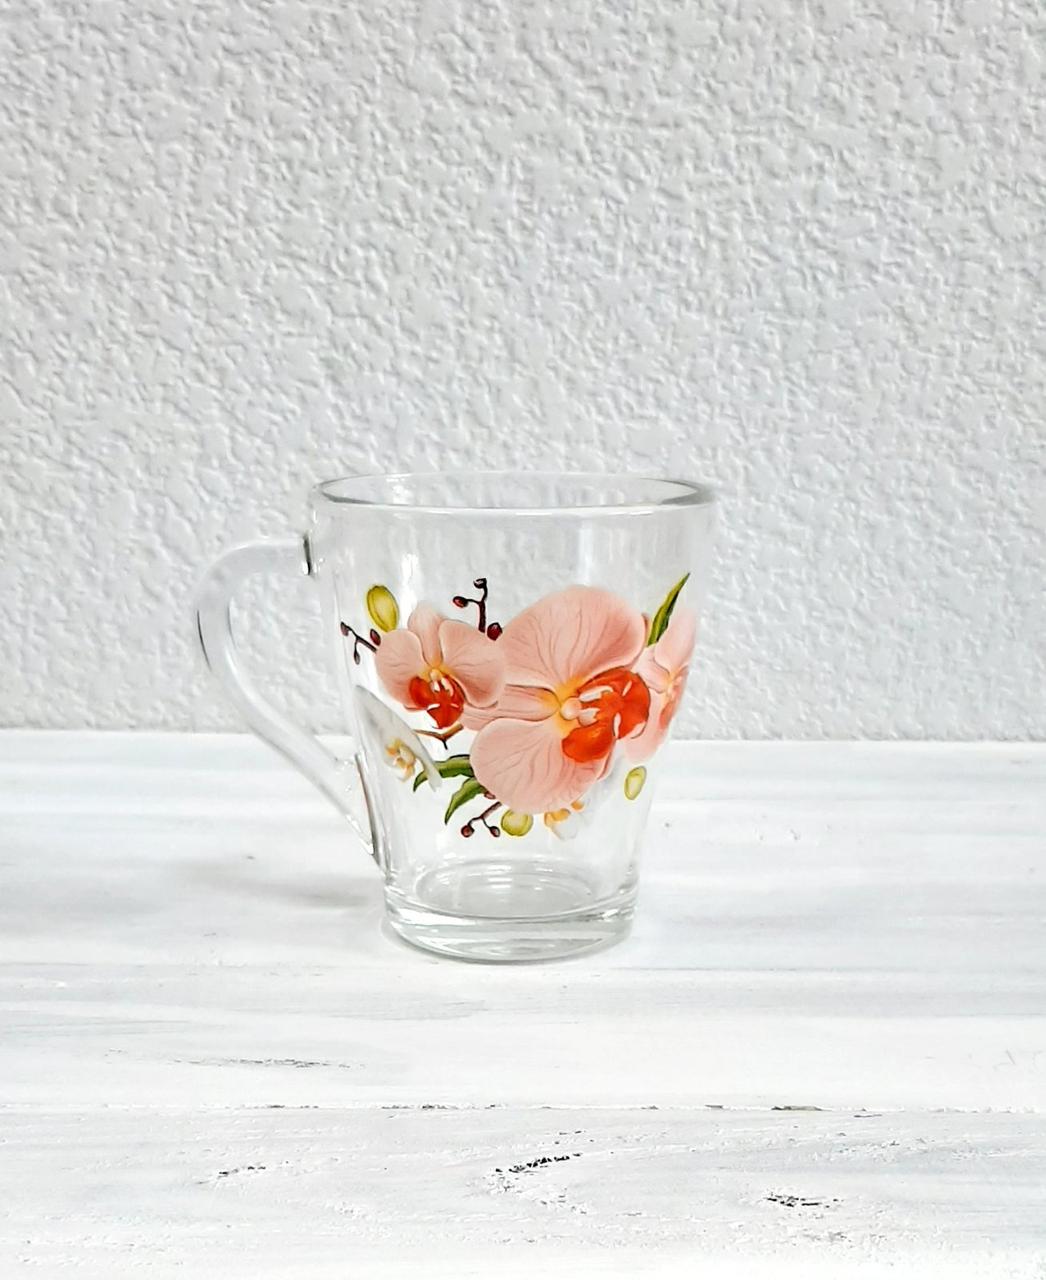 Кружка Грация 280 мл Орхидея 13с1649/0